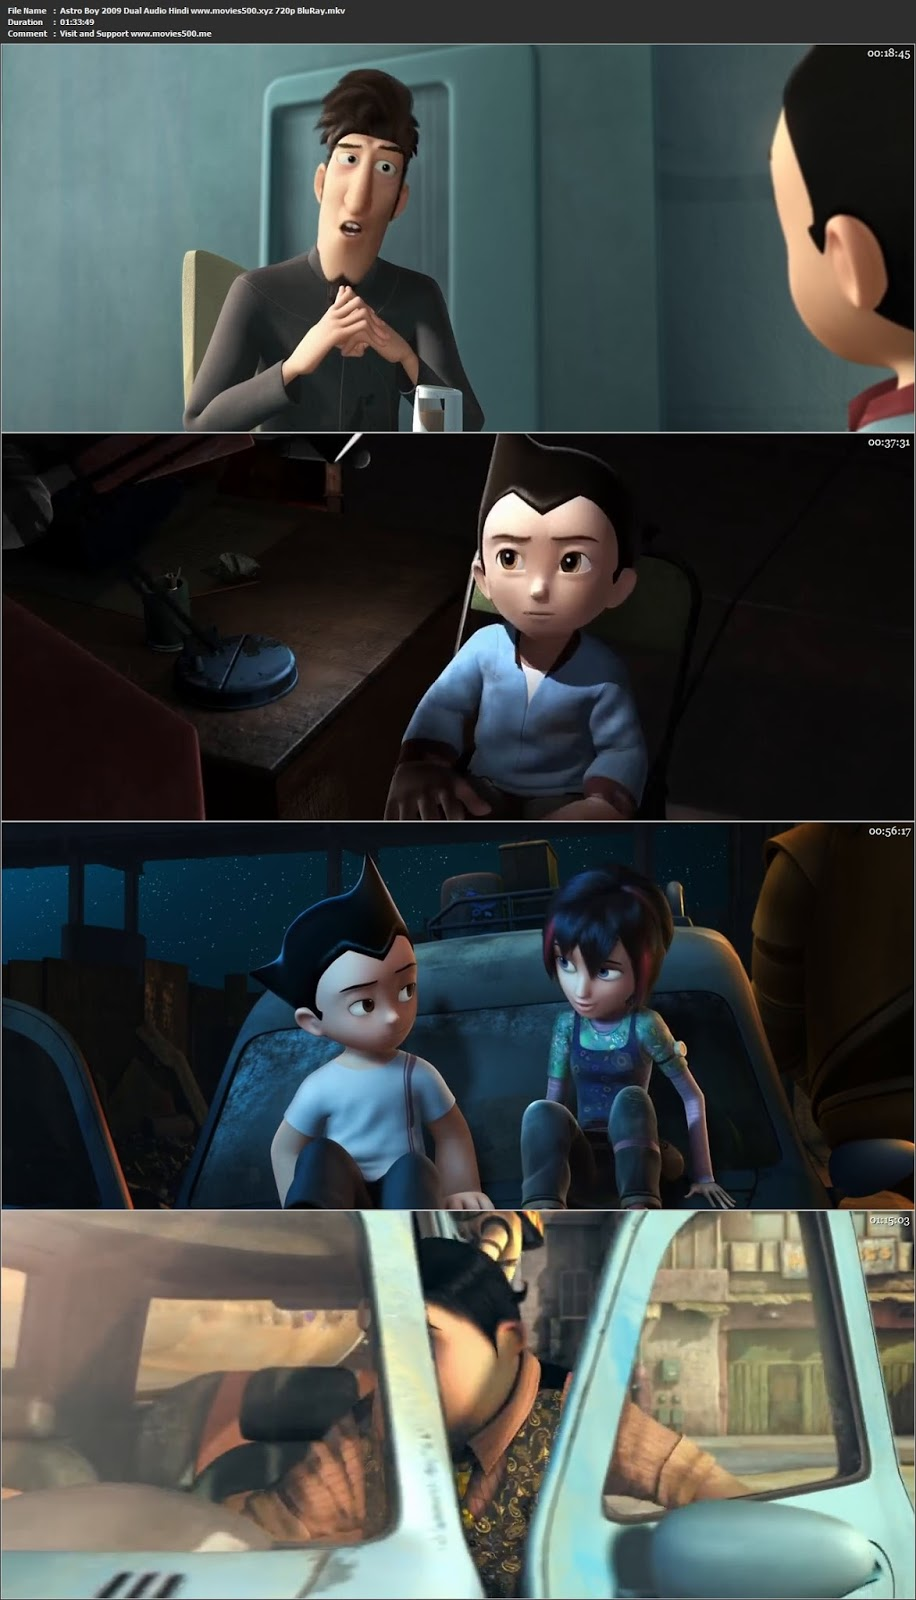 Astro Boy 2009 Dual Audio Hindi Full Movie BluRay 720p at movies500.info